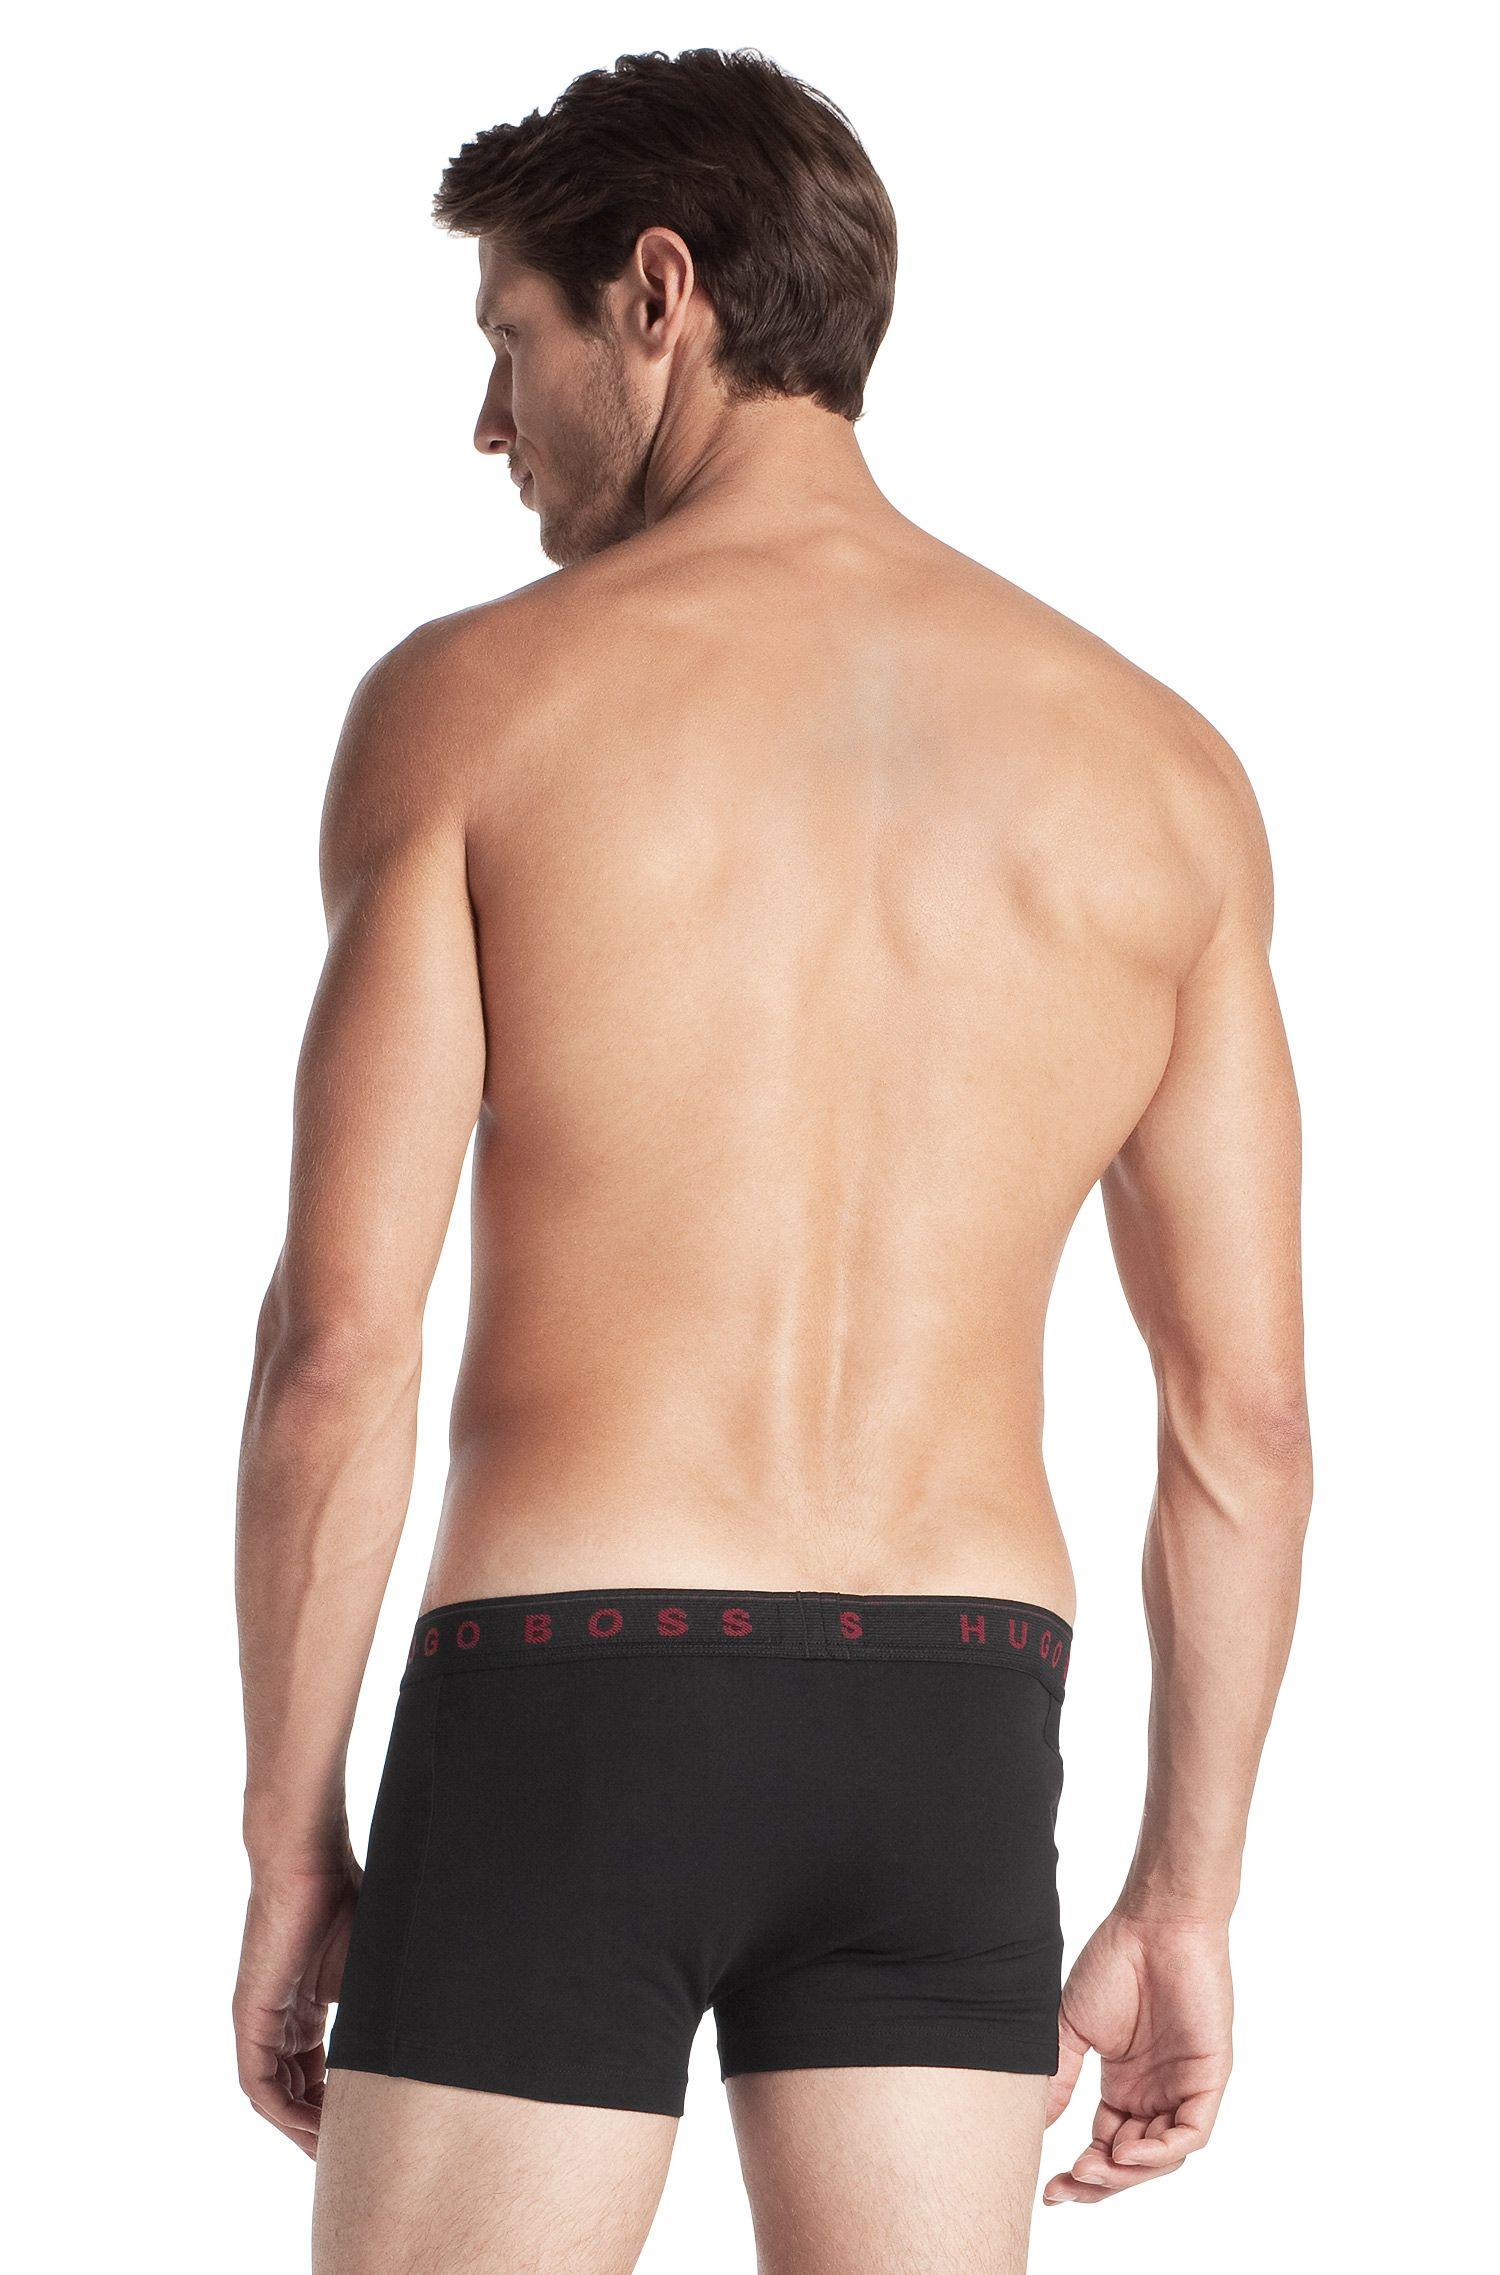 3er-Pack Boxershorts ´Boxer 3P BM`, Schwarz